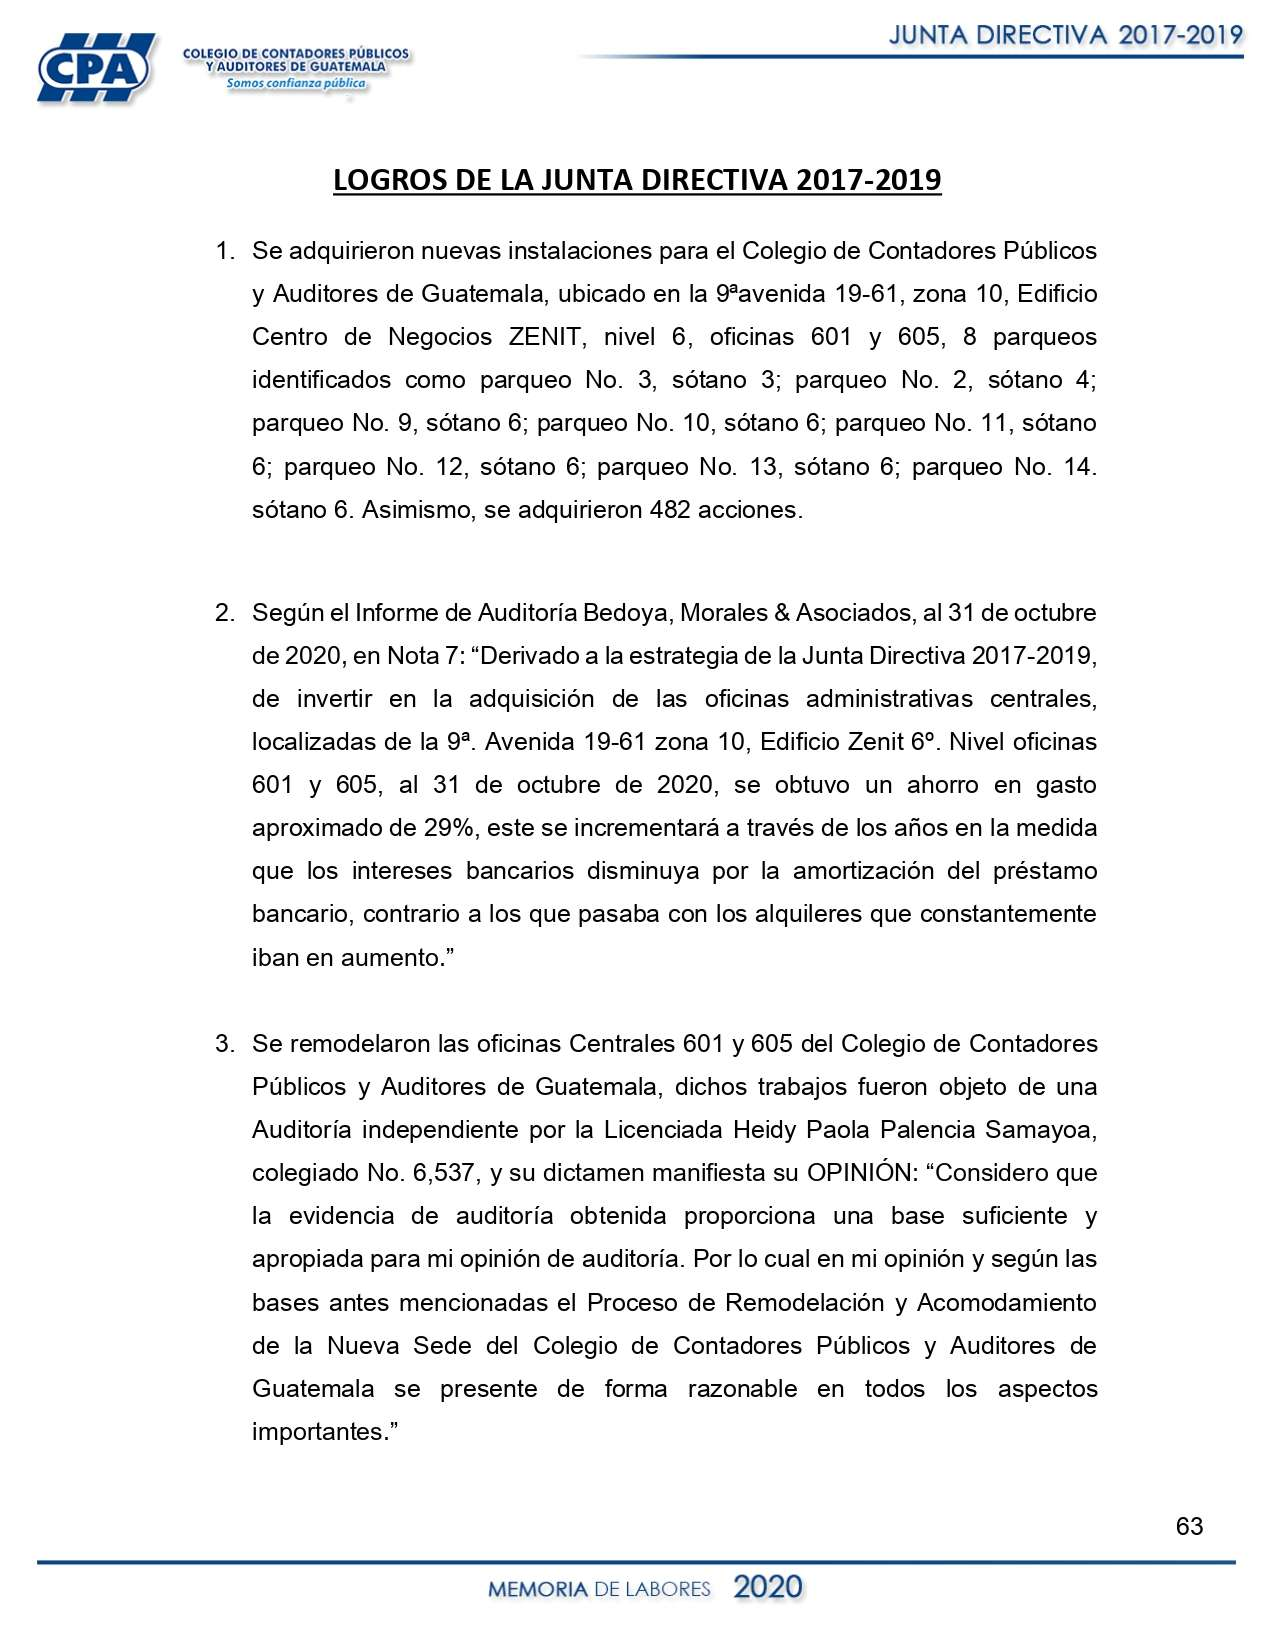 LOGROS DE JUNTA DIRECTIVA 2017-2019